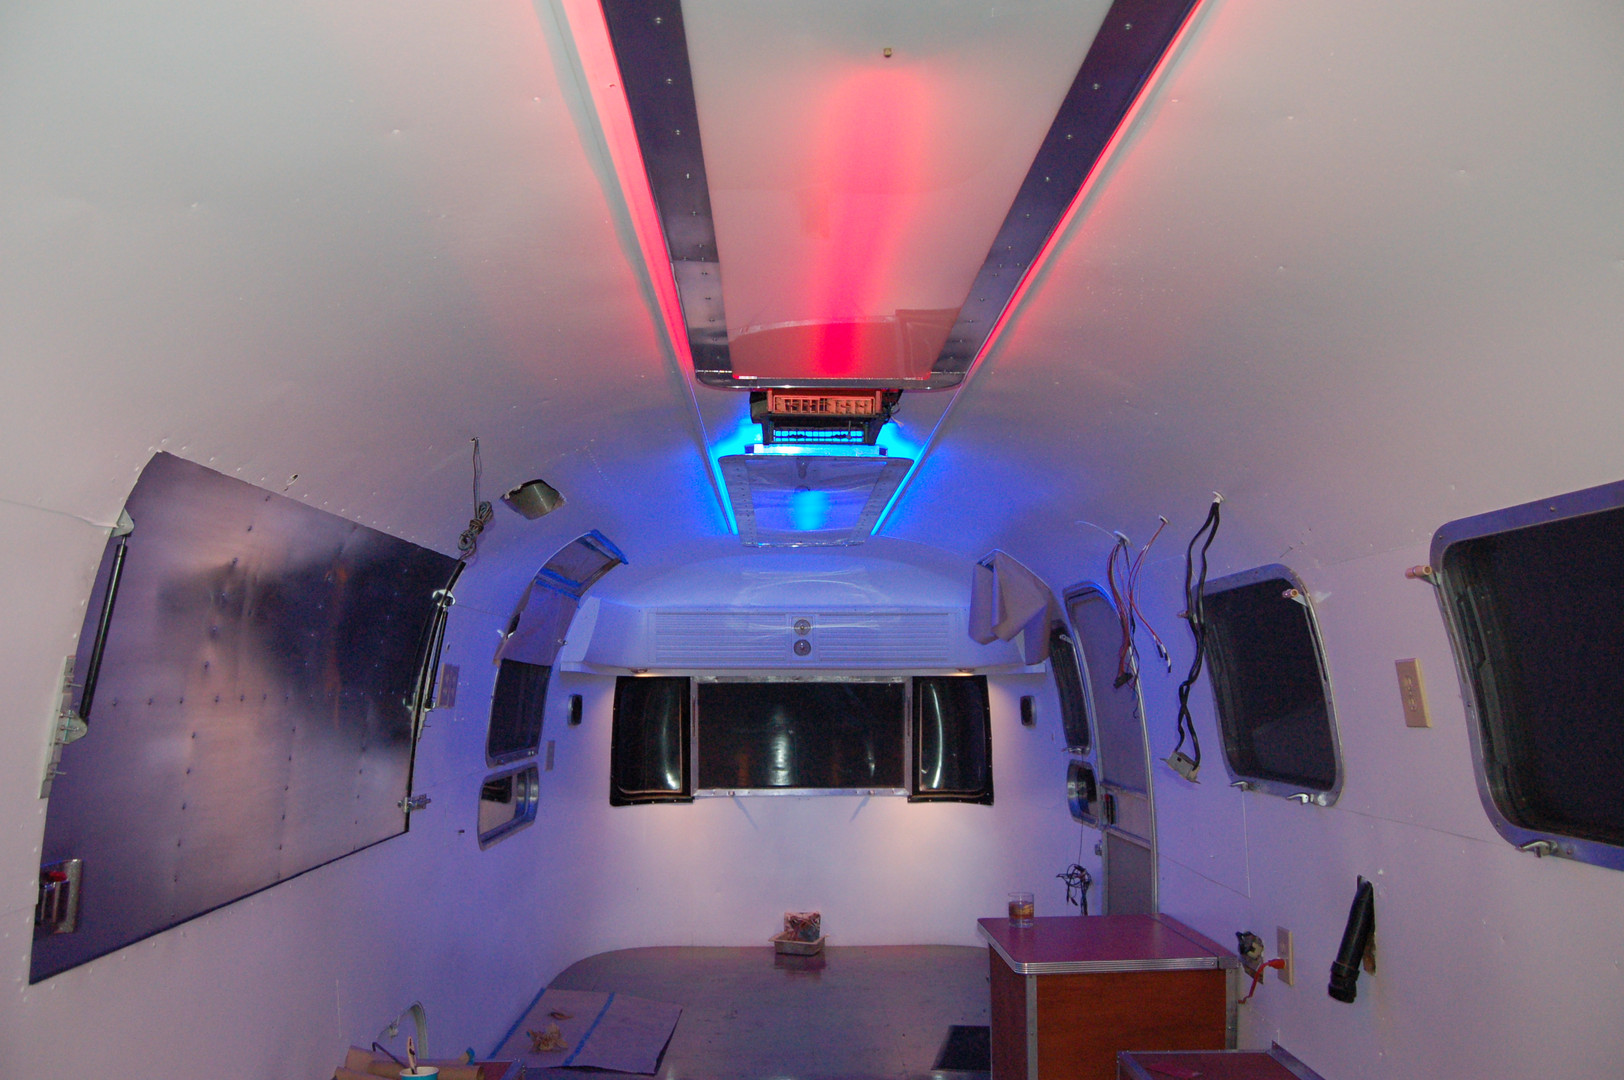 Overlander night LED pics - 16.JPG